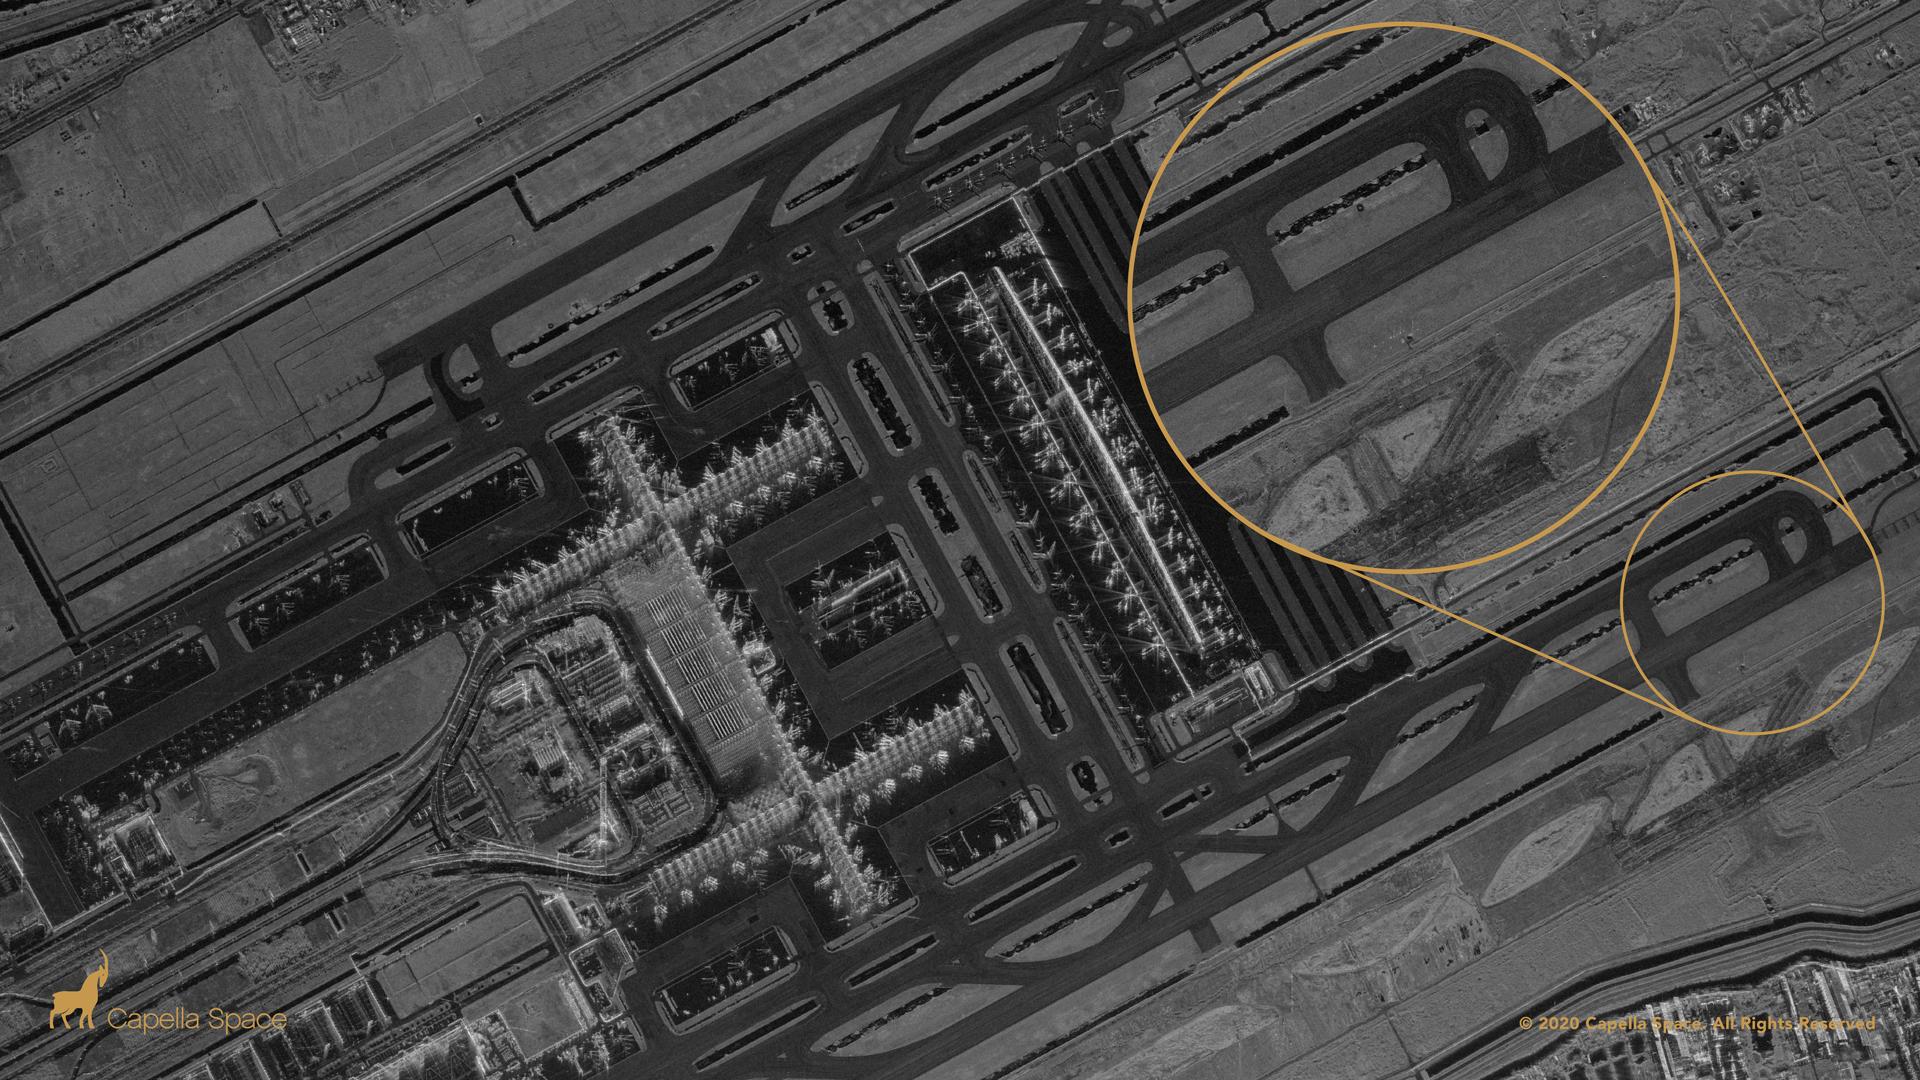 Suvarnabhumi Airport, Thailand: Smooth surfaces like runways appear dark to radar